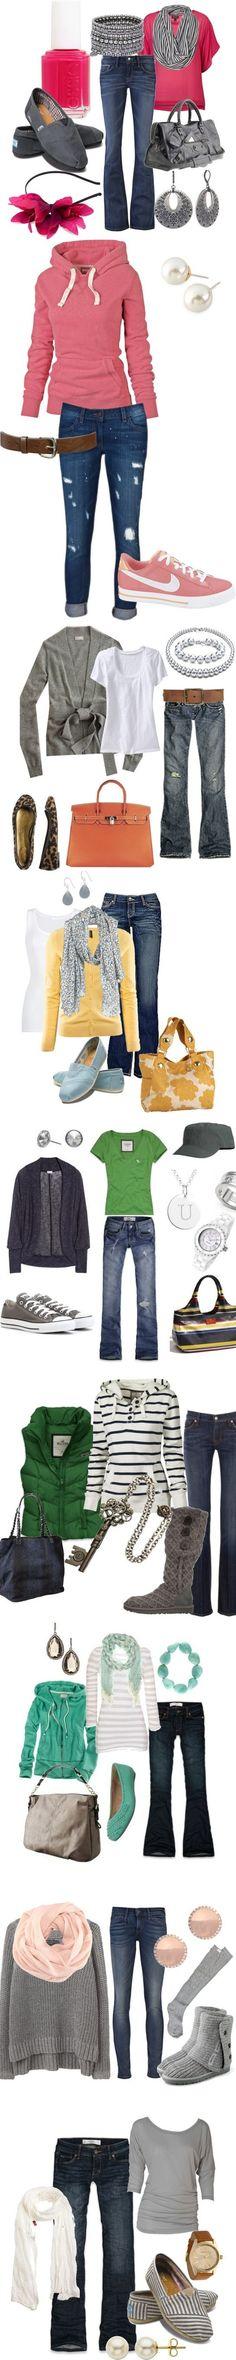 femme, vetements, clothes, girl, bag, shoes, chaussures, high heels, talon haut, mode, fashion